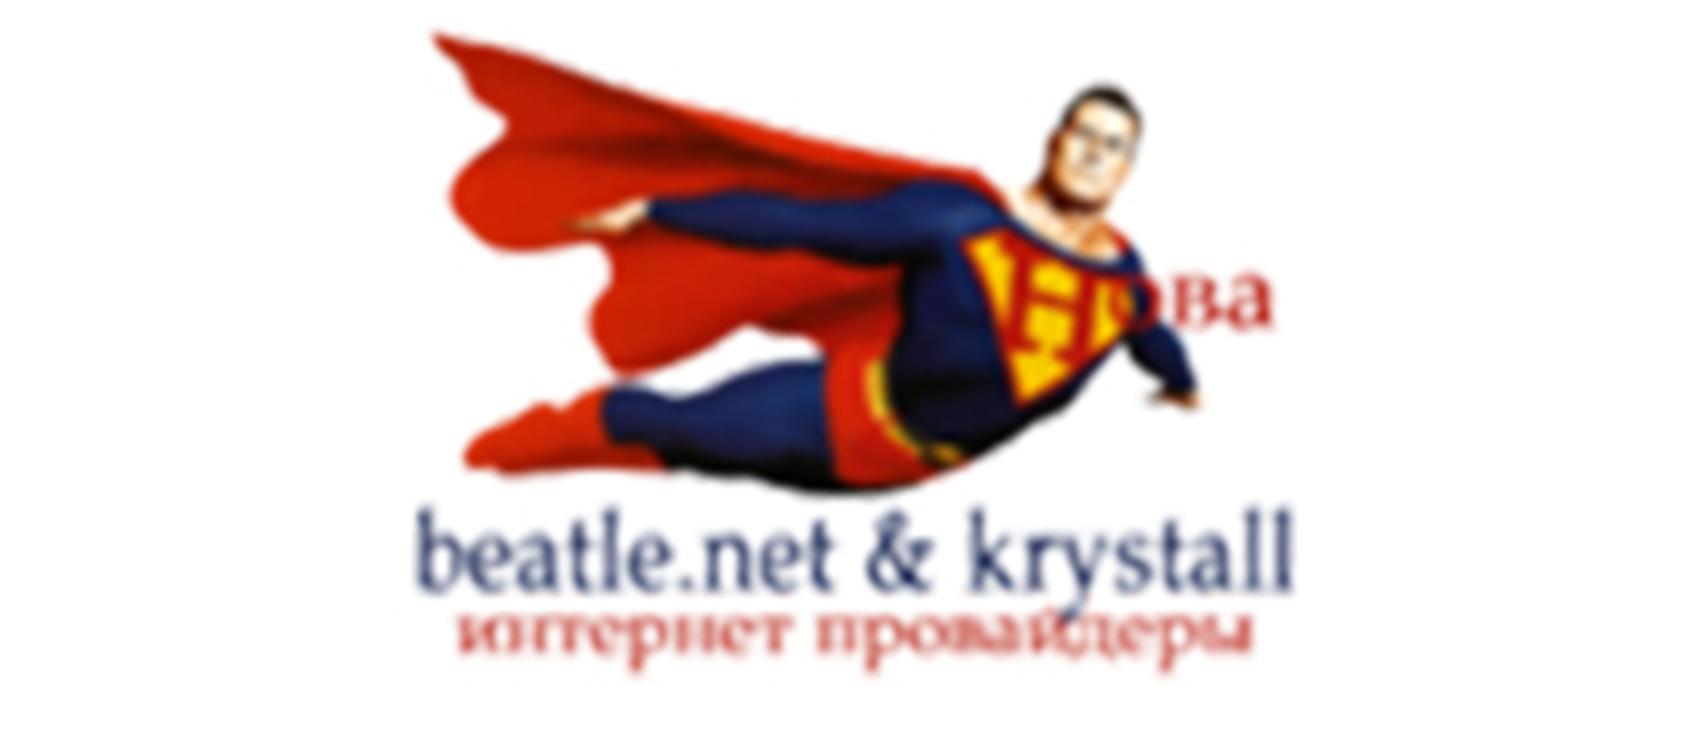 BEATLE.NET (Чернигов)